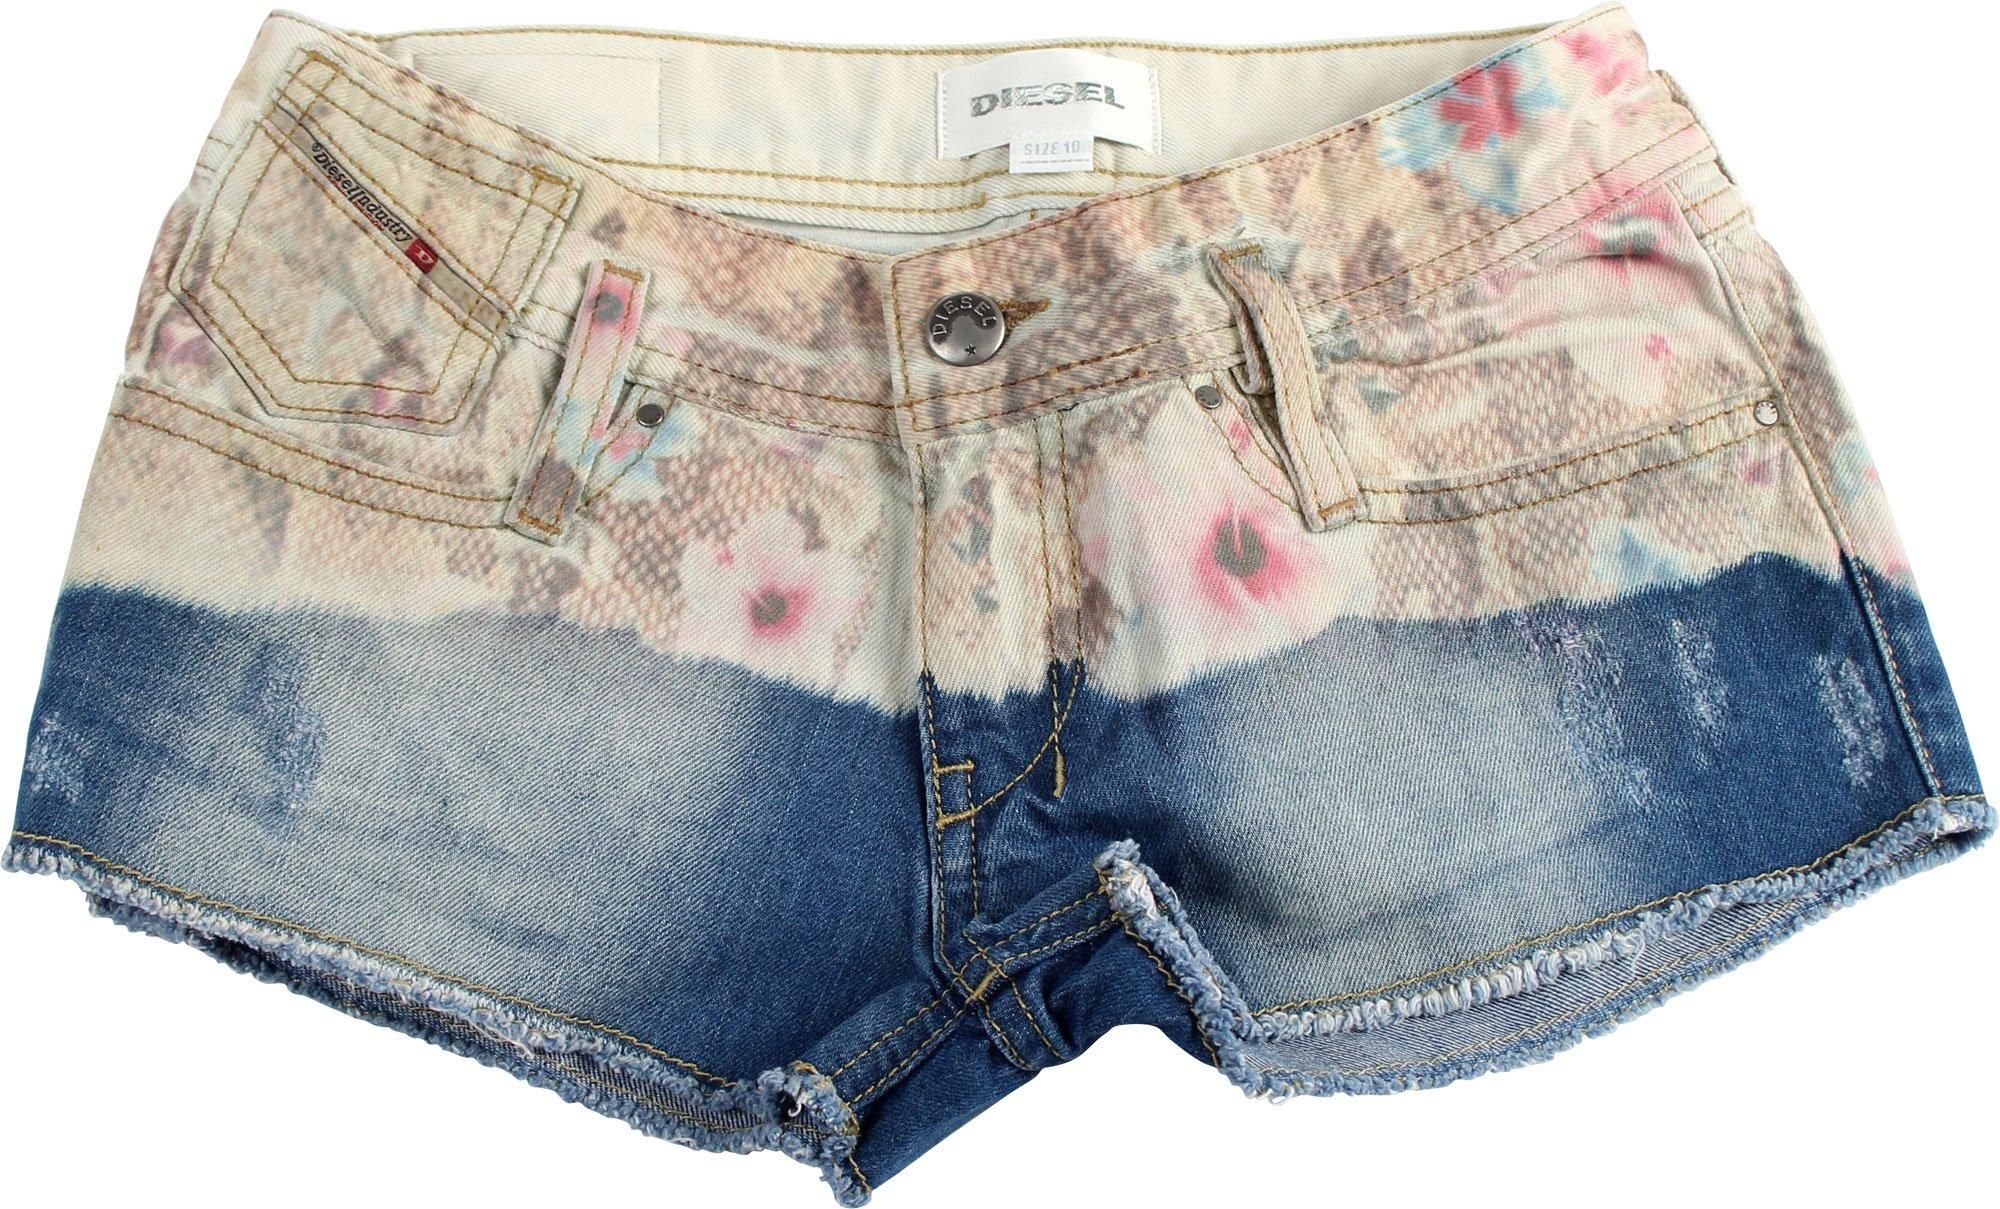 Diesel Big Girls' Matic Denim Short with Floral Print, Indigo, 14 Years